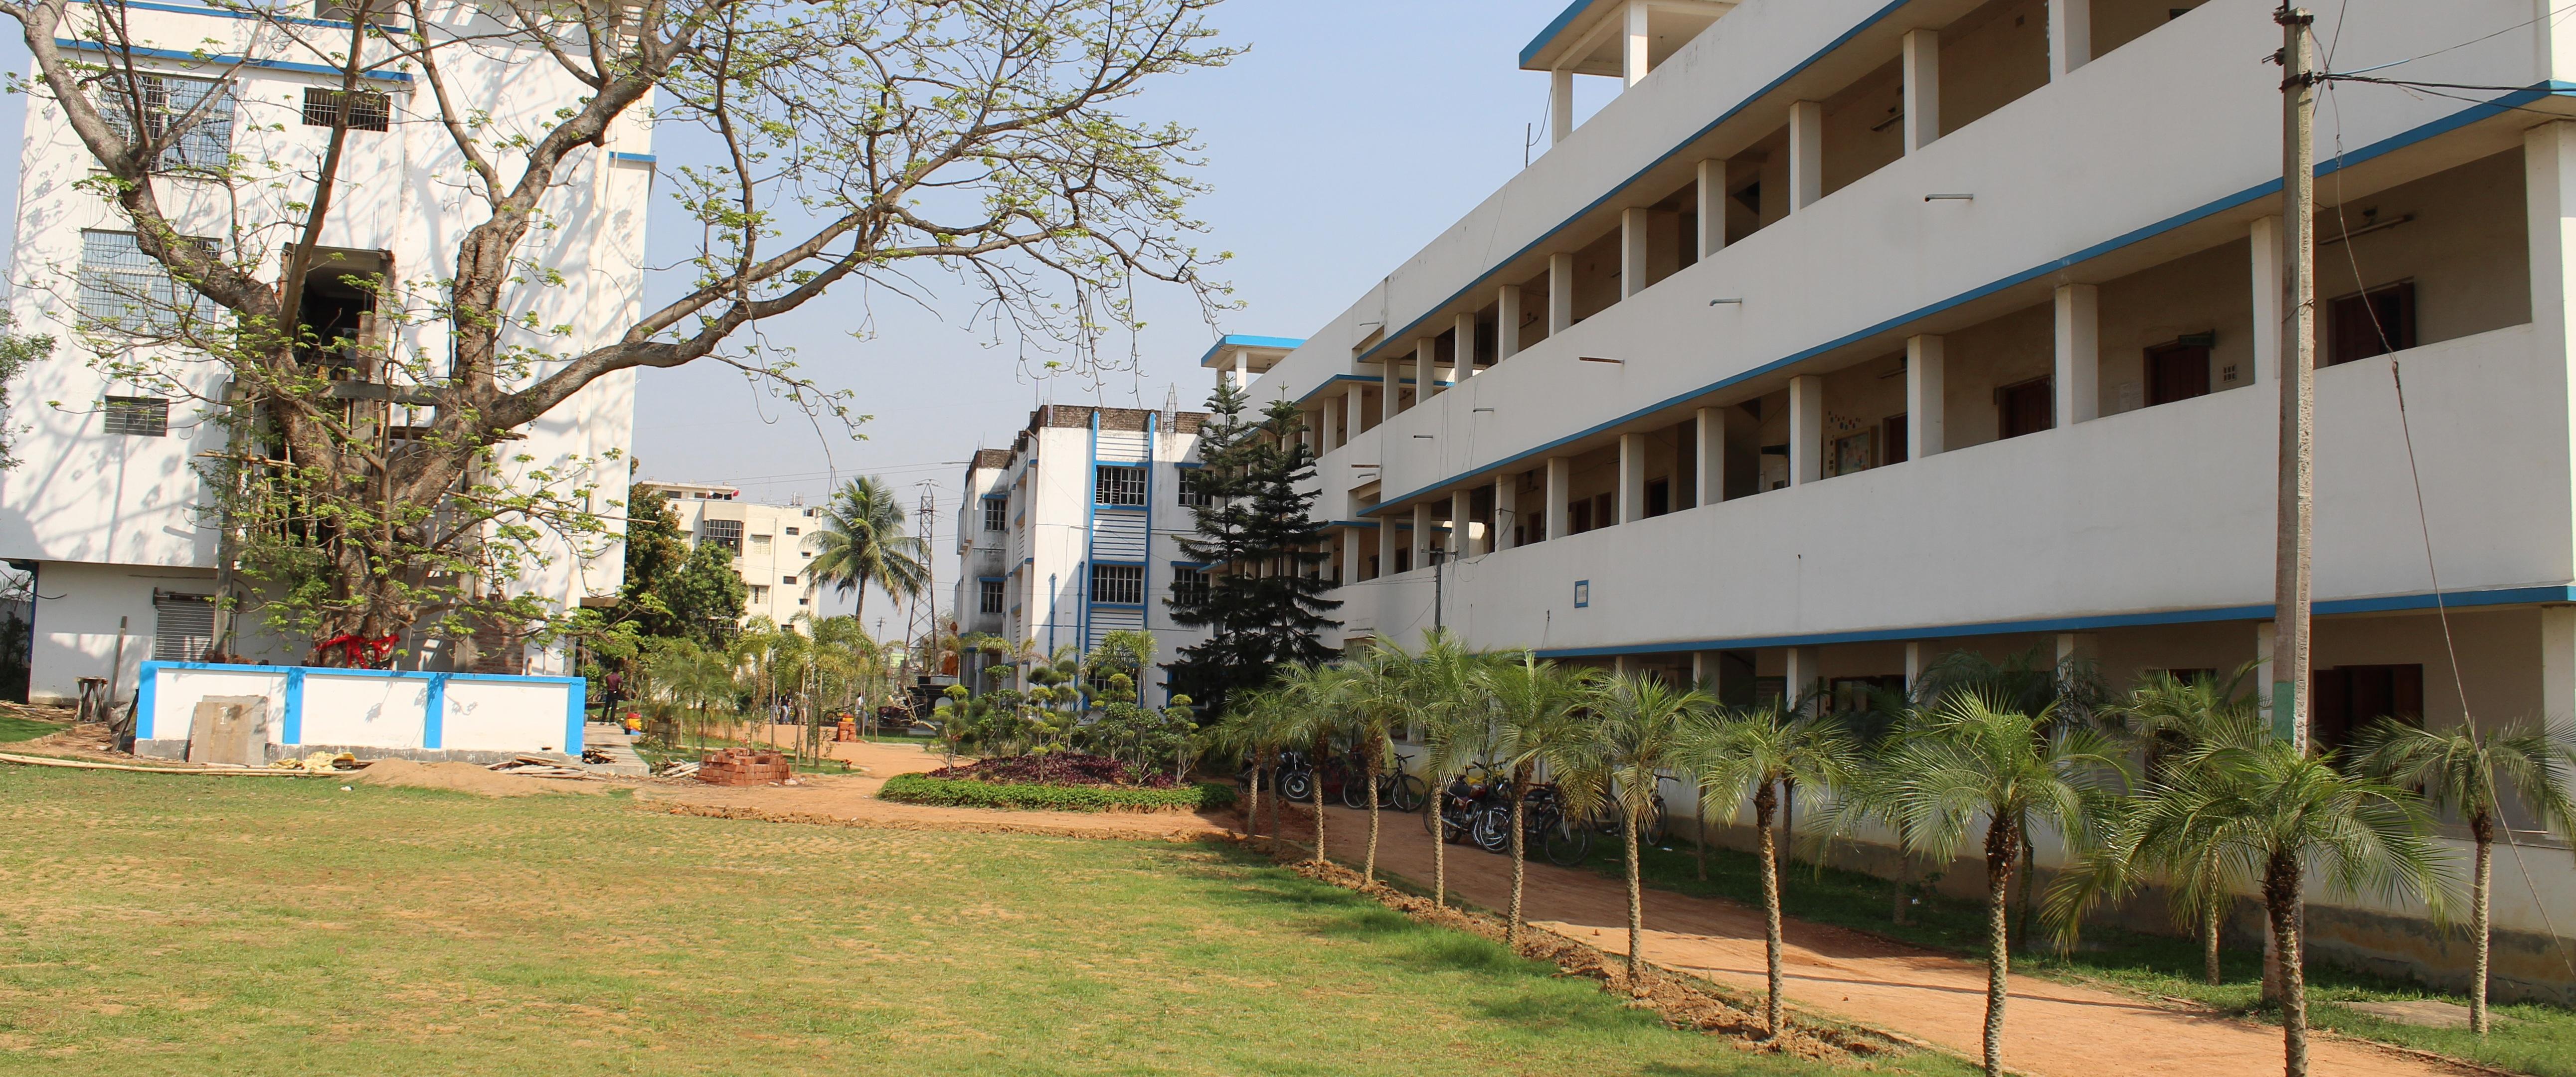 Birbhum Vivekananda Homoeopathic Medical College And Hospital, Sainthia Image